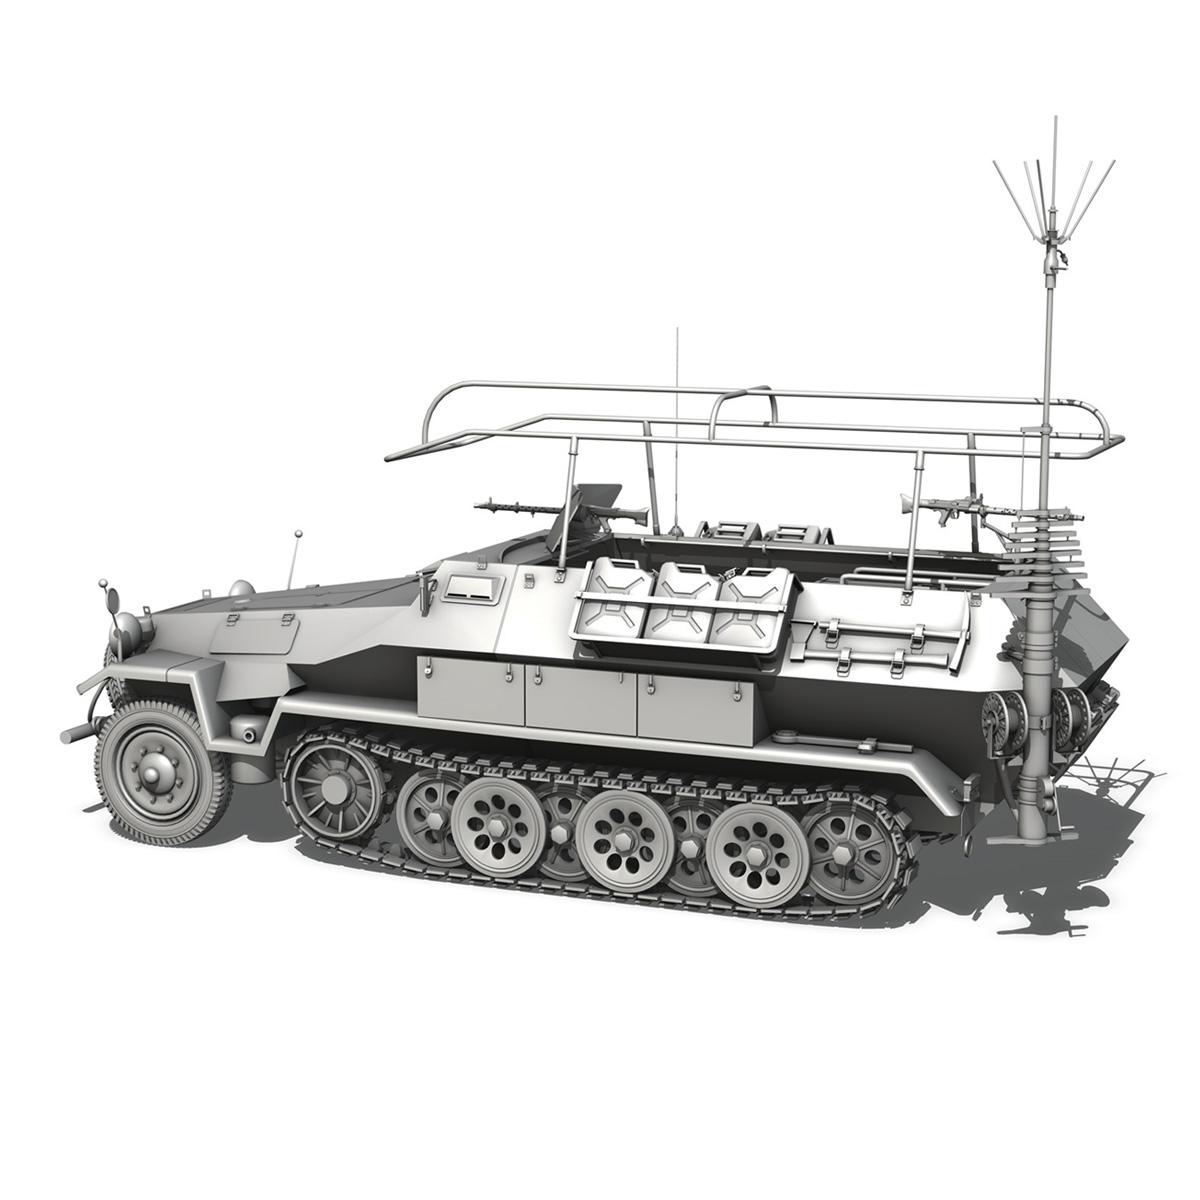 sdkfz 251 ausf.b – communications vehicle 3d model 3ds fbx c4d lwo obj 251694